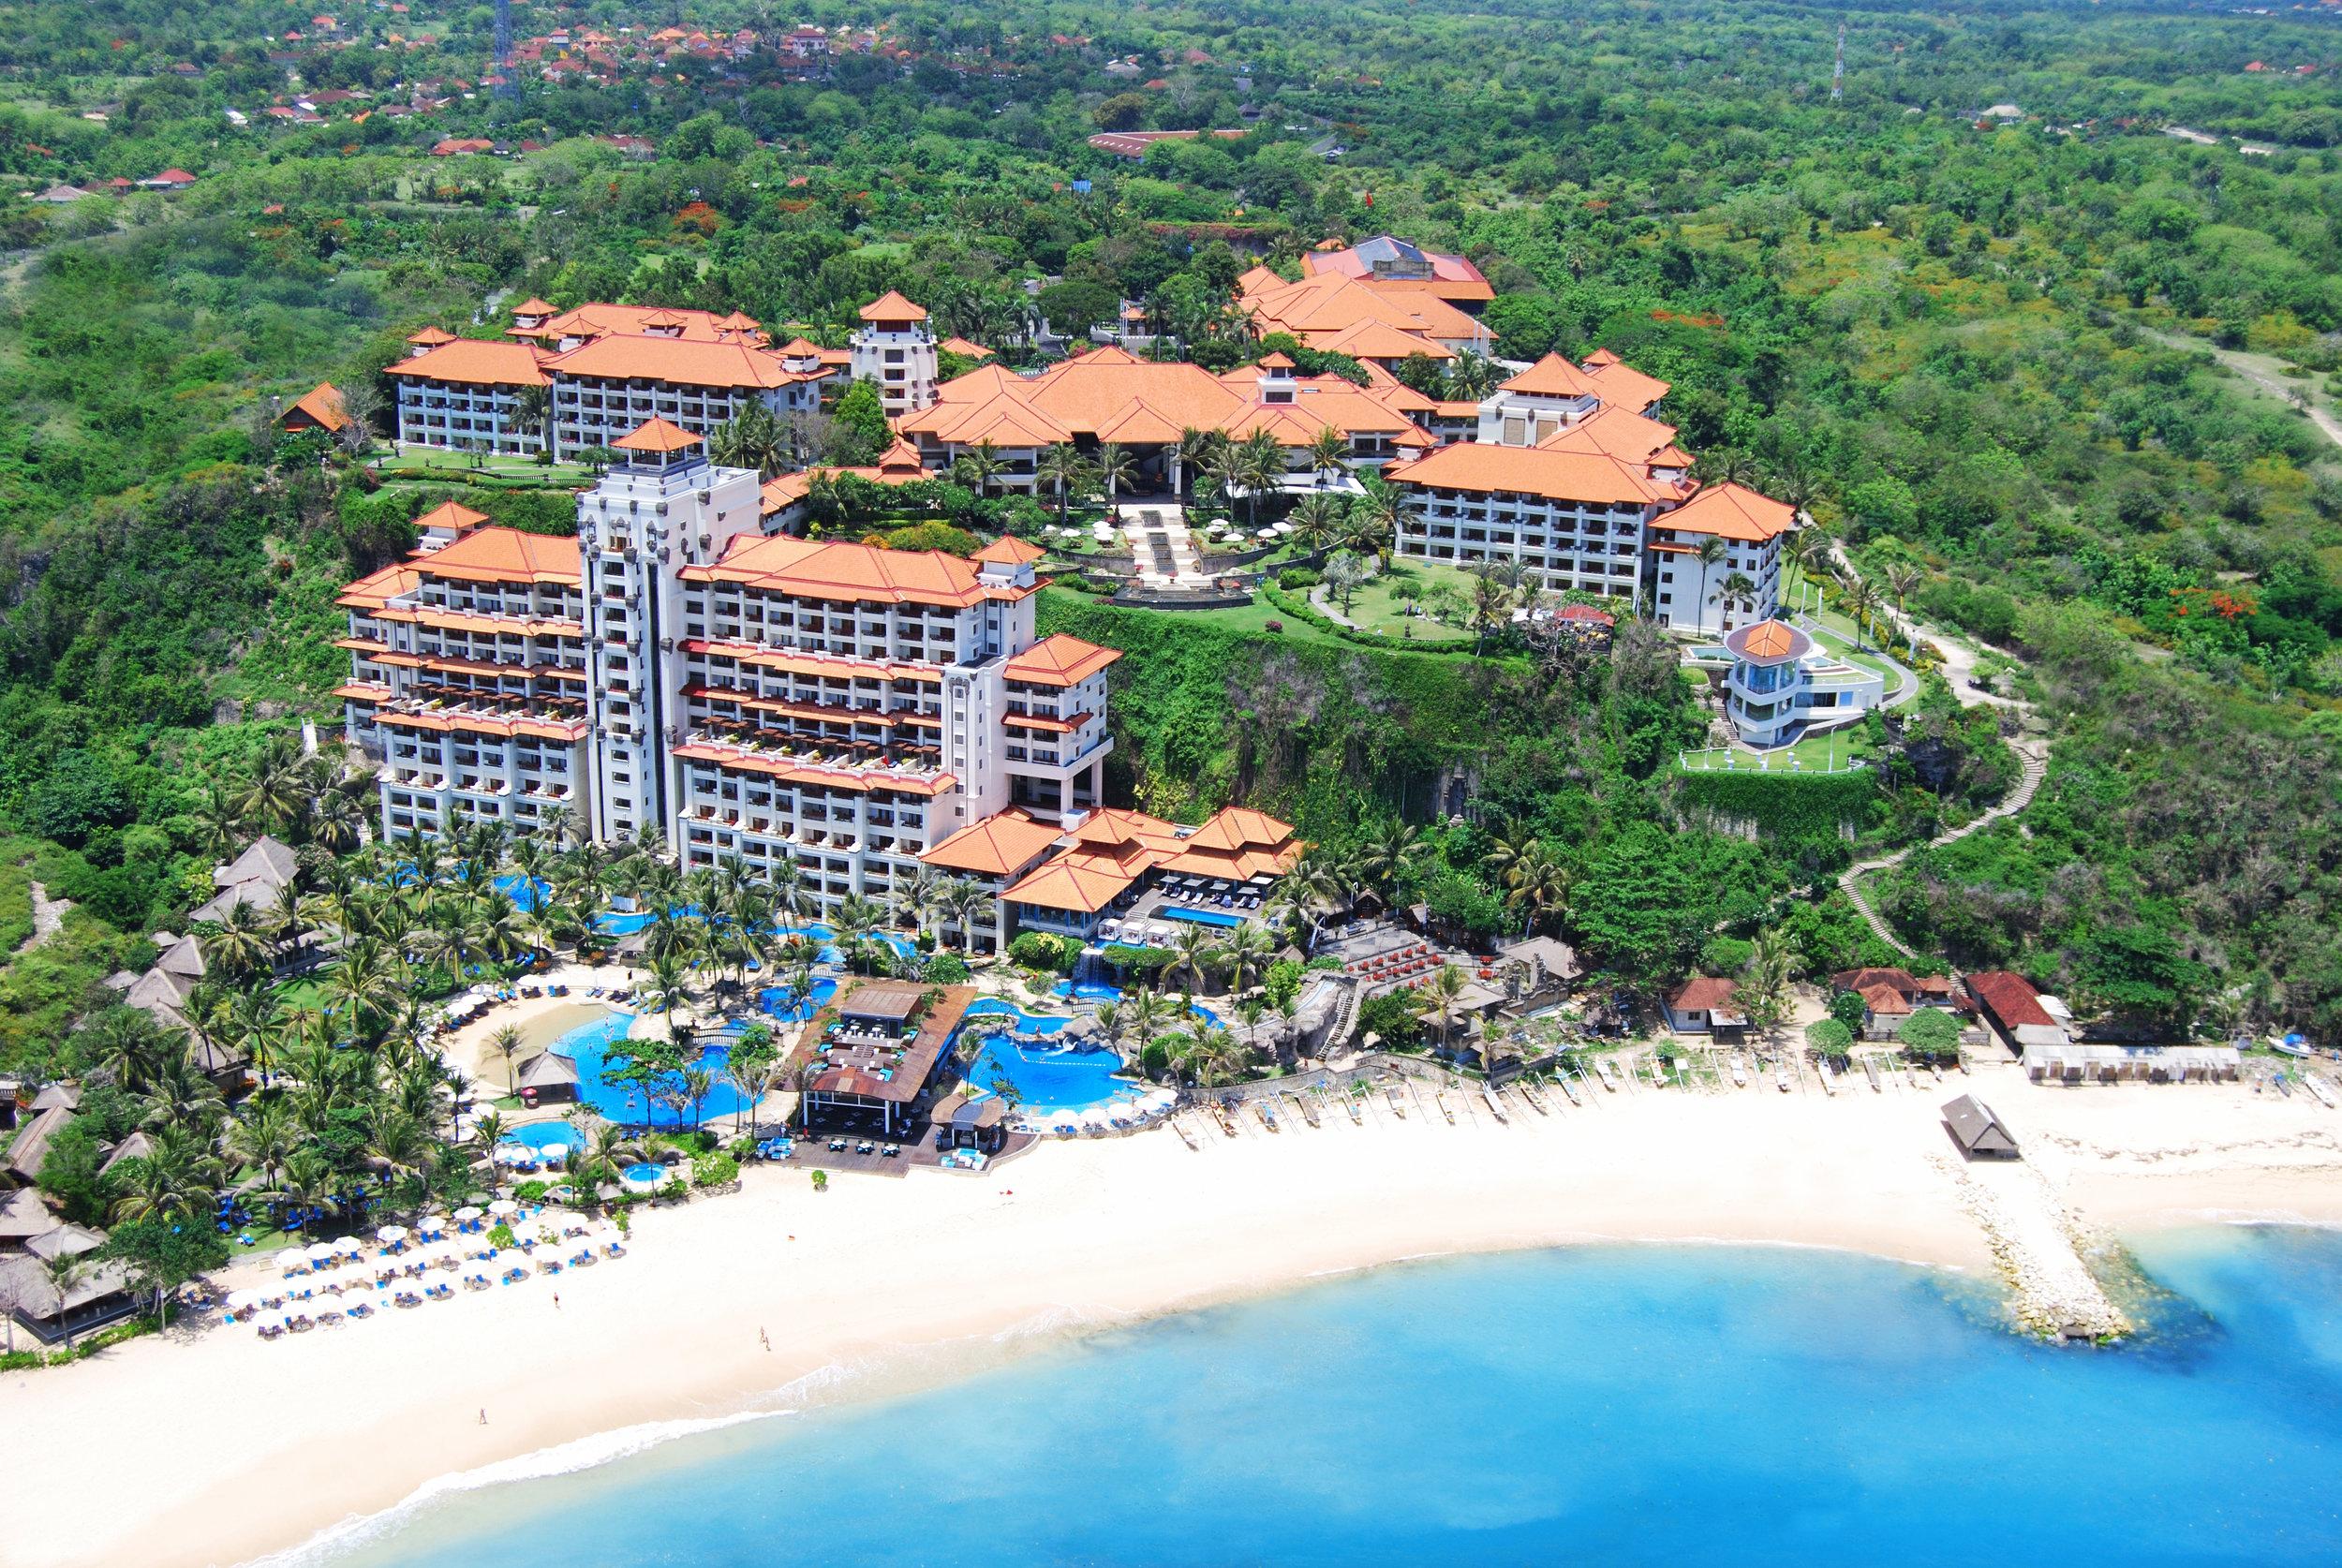 Resort Exterior | Photo Credit: Hilton Bali Resort